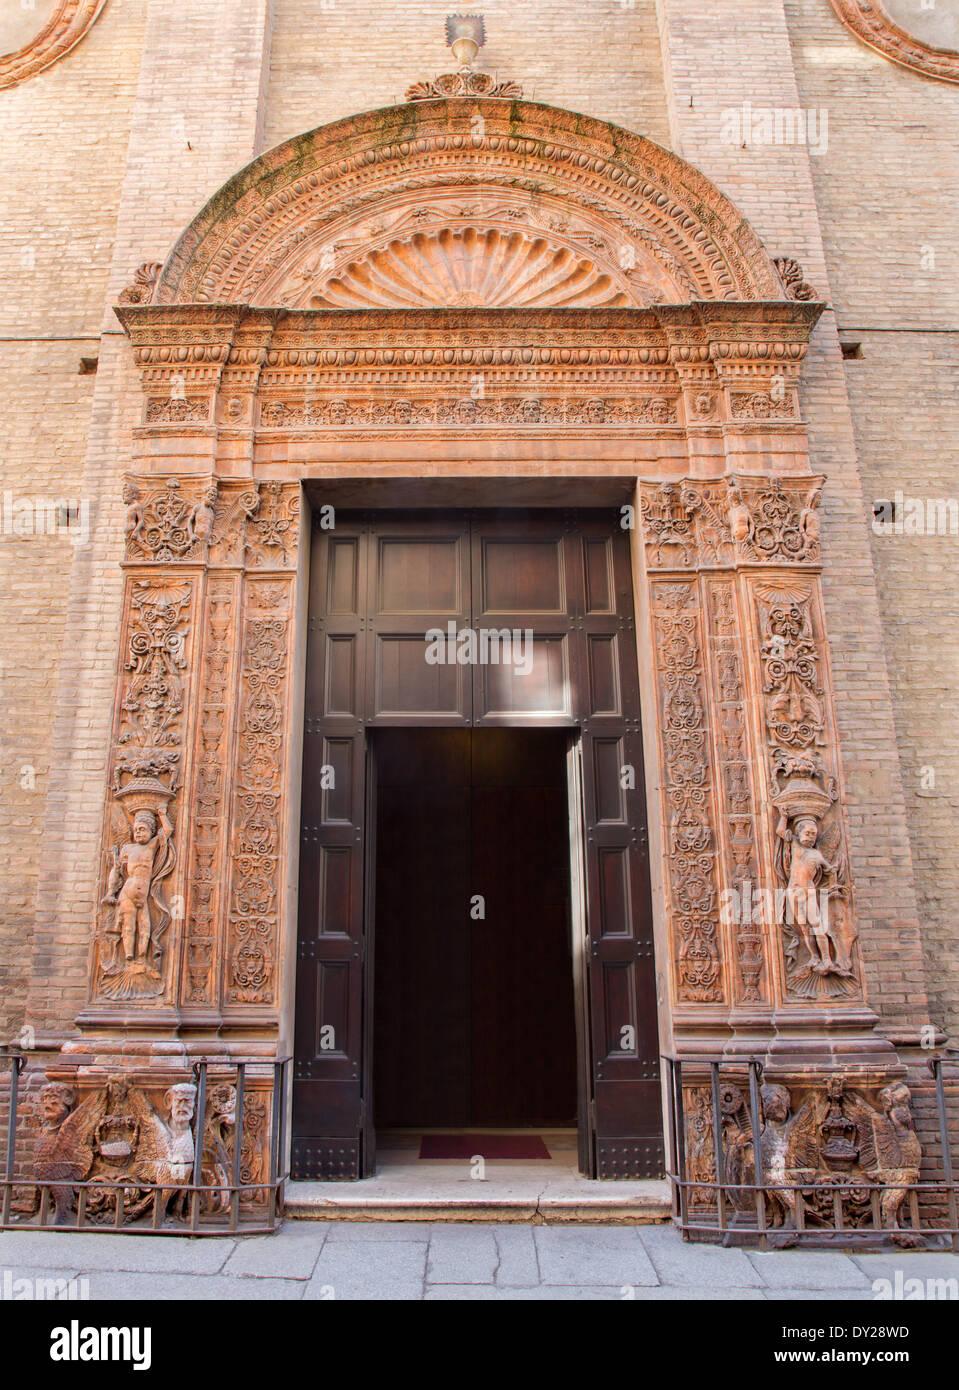 BOLOGNA, ITALY - MARCH 17, 2014: Renaissance portal of church Chiesa Corpus Christi. - Stock Image